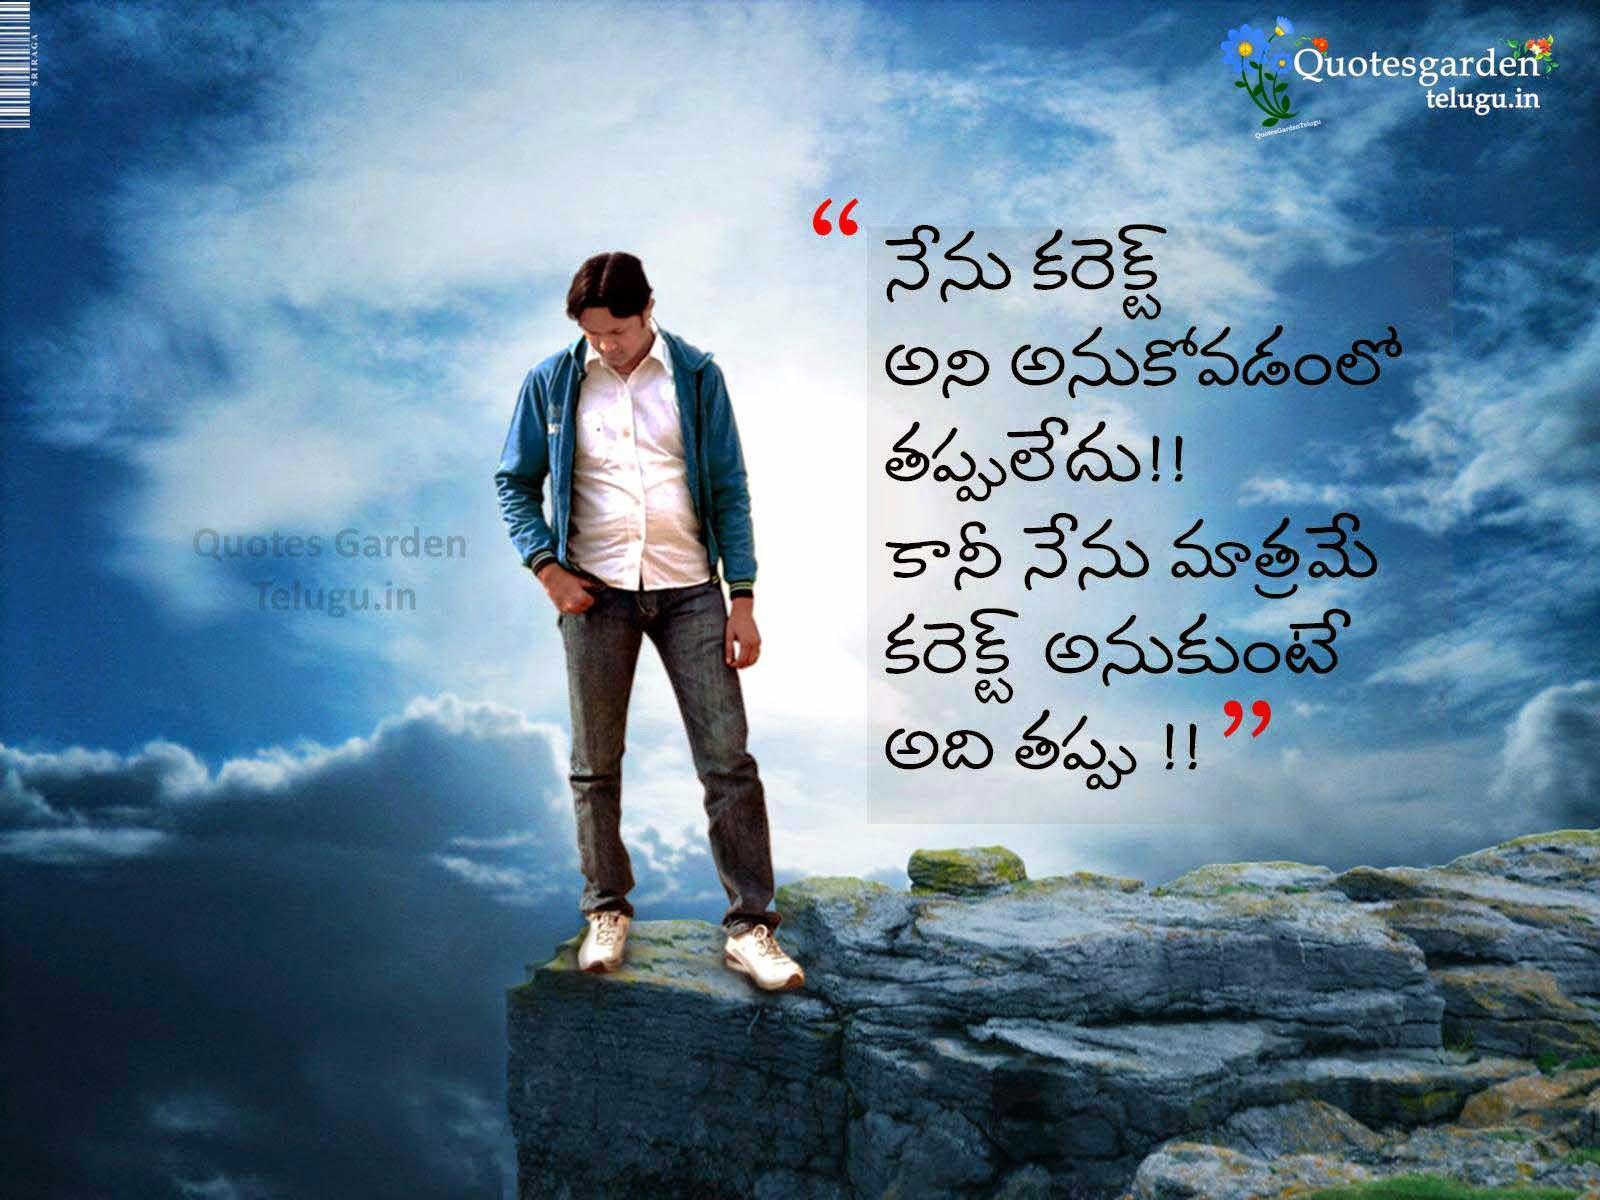 Famous Inspirational Quotes Life Famous Telugu Quotes  Best Telugu Life Inspirational Quotes